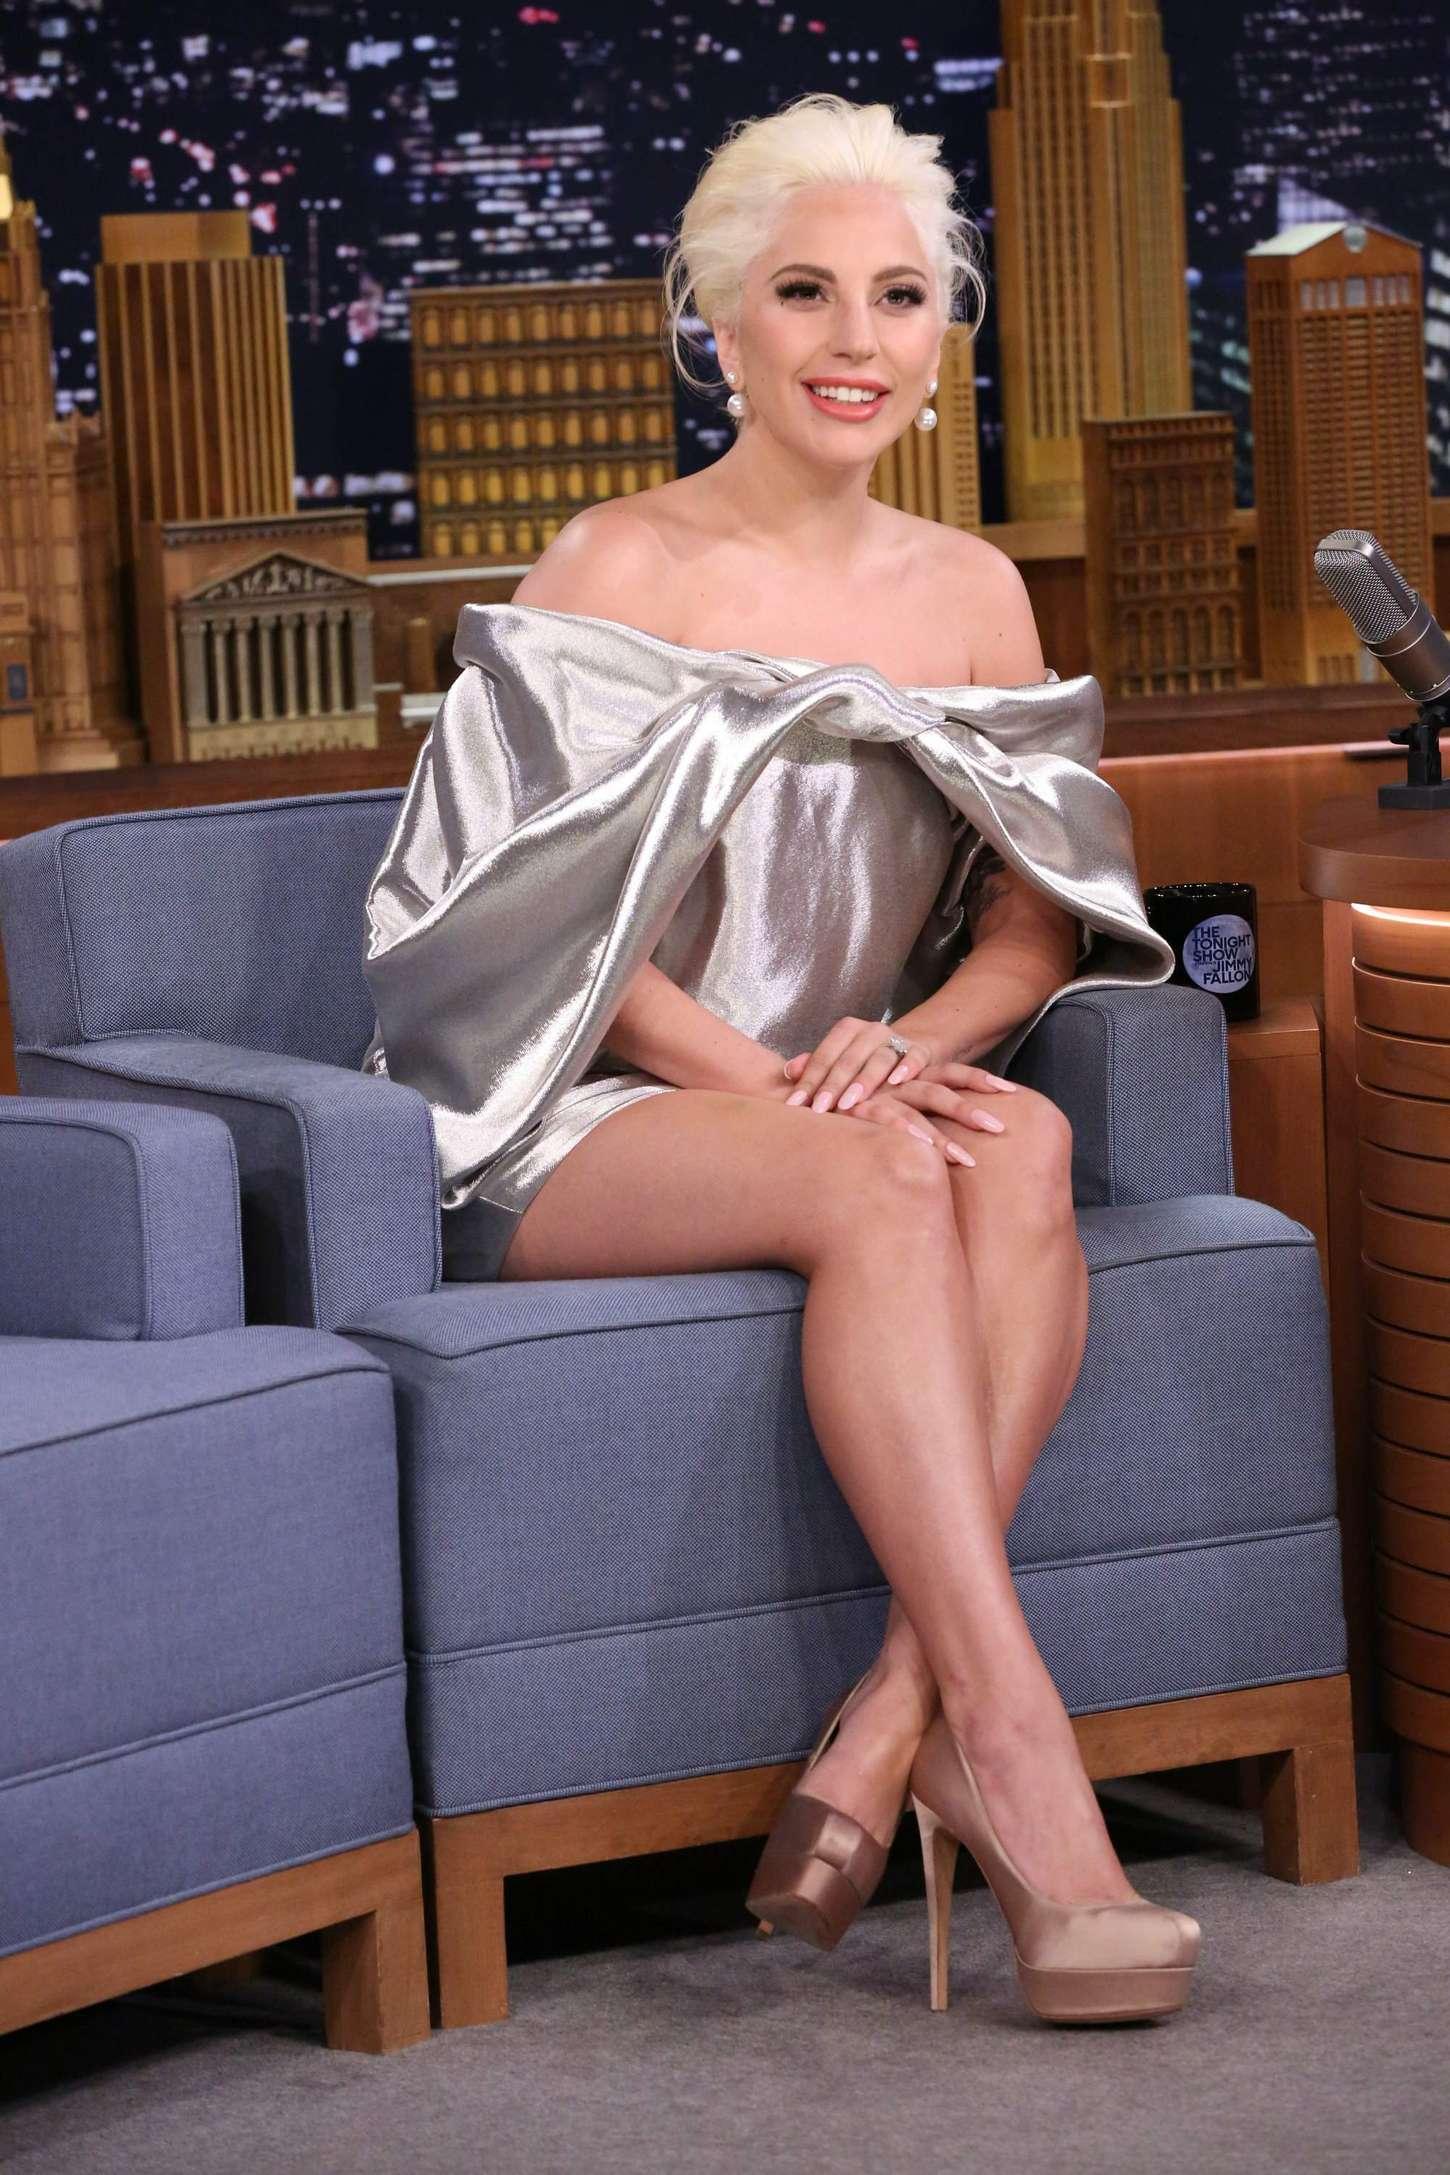 sexy santa girls naked